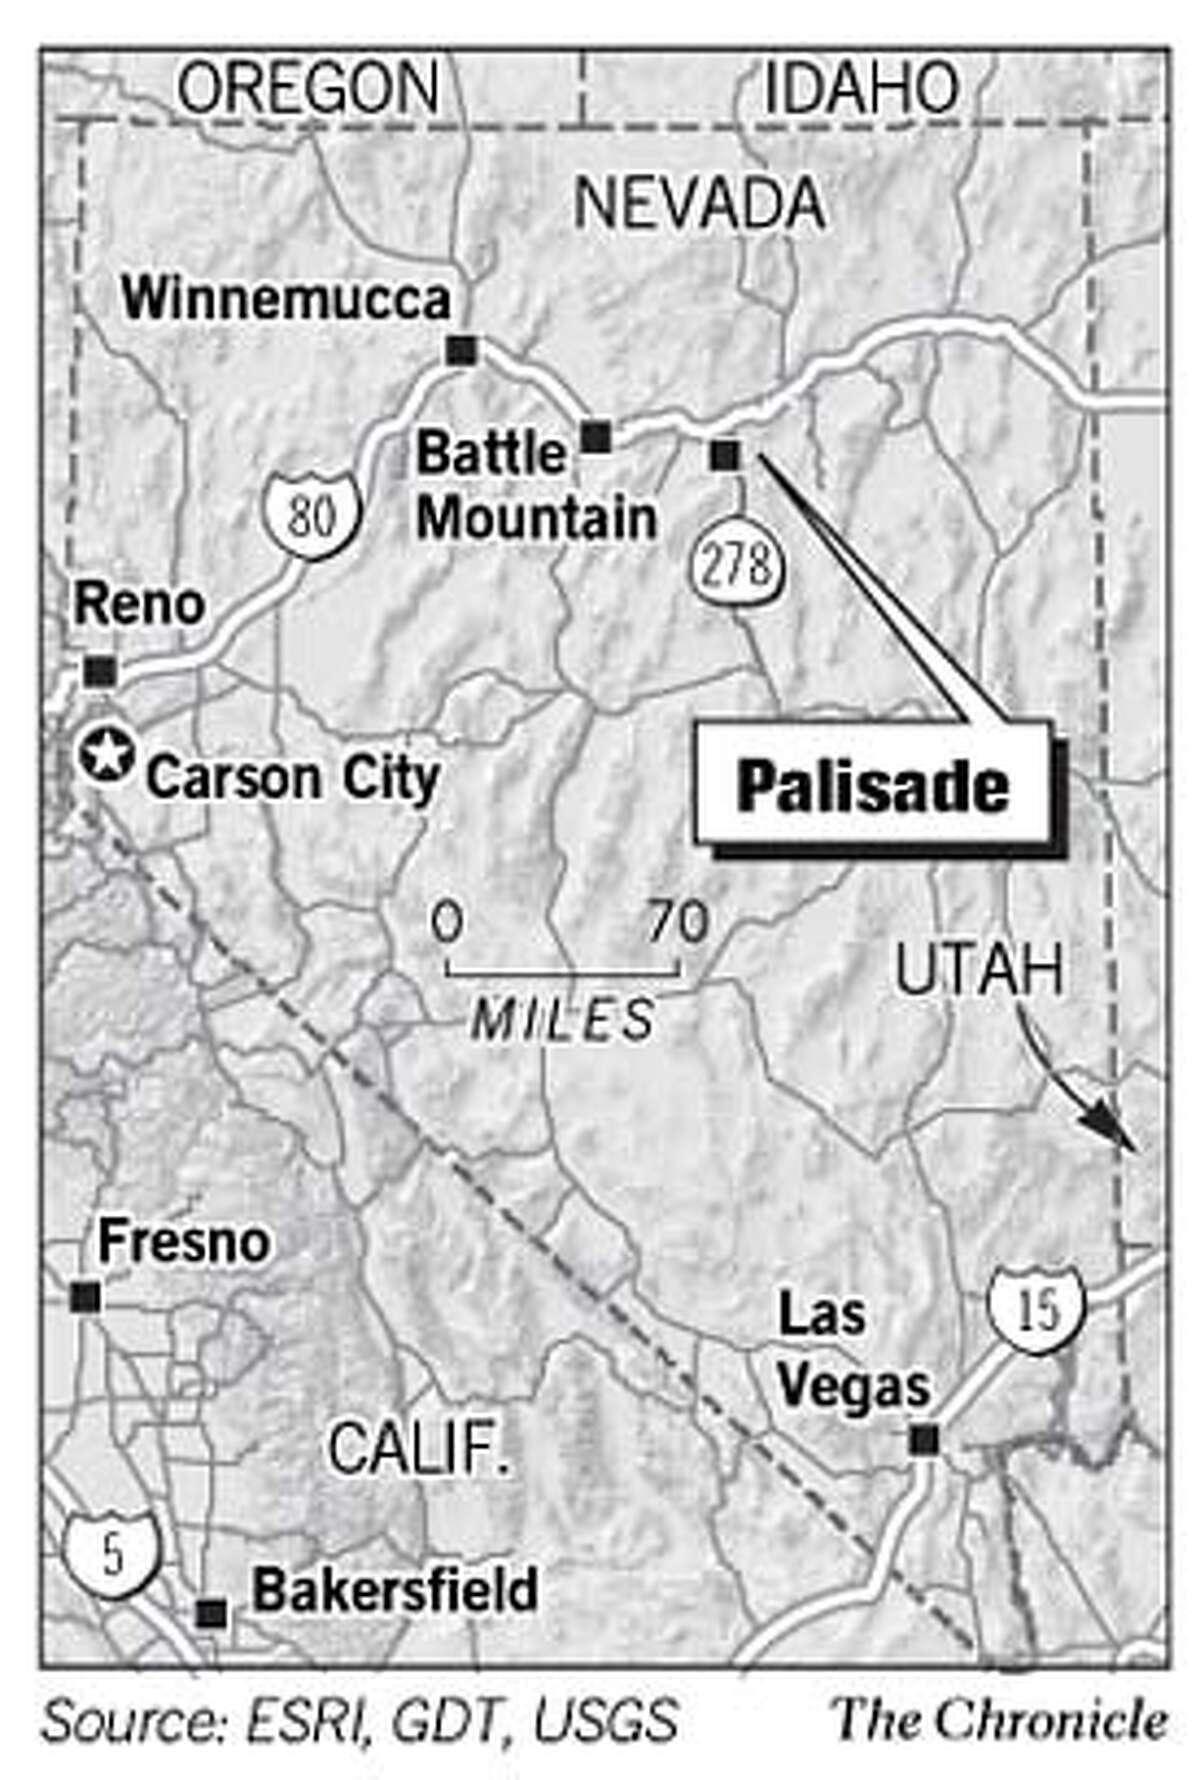 150,000 bid for a Nevada City.